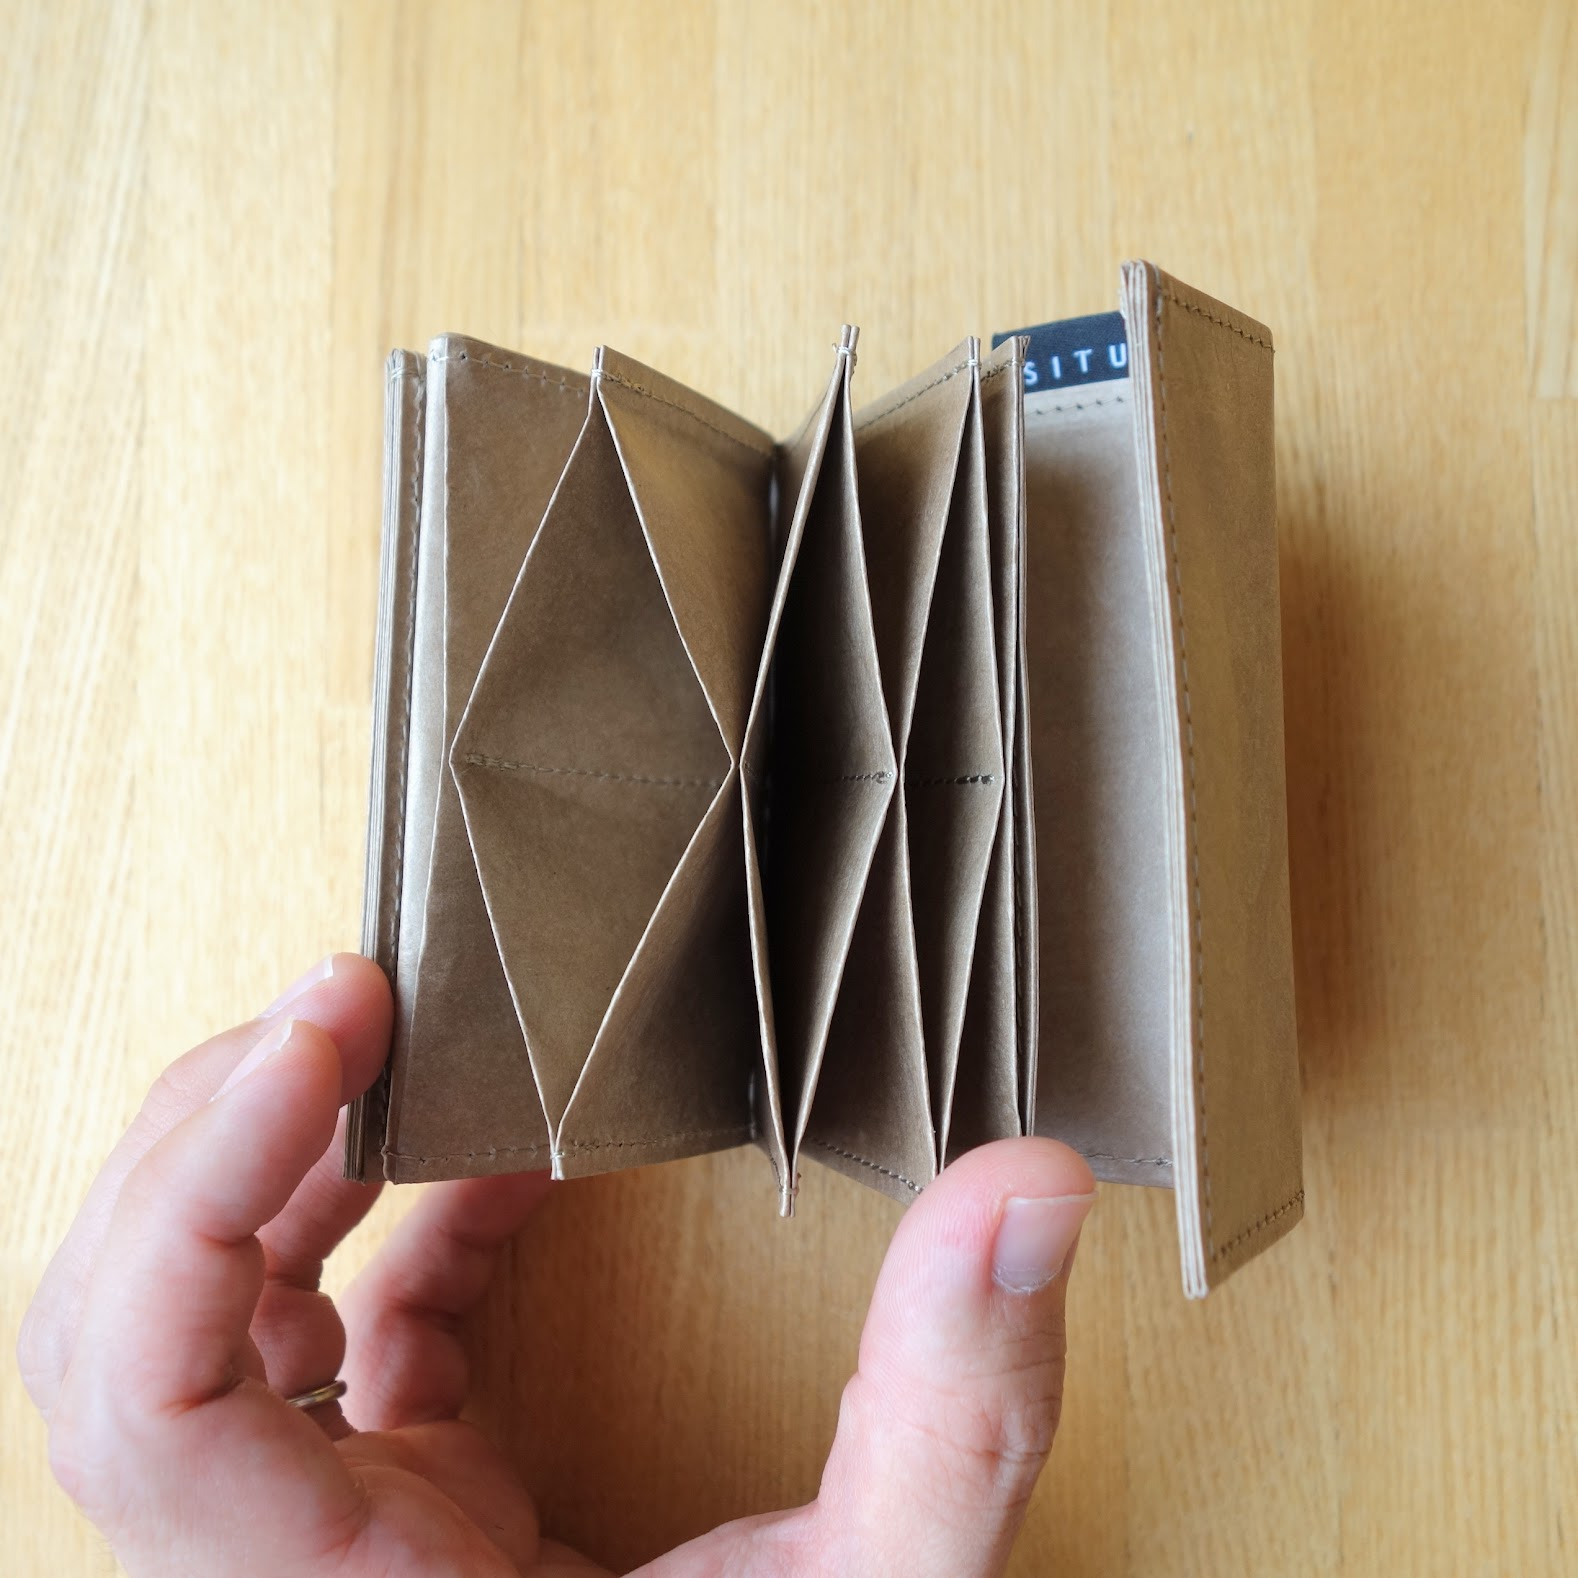 SITUS ミニマリストウォレット カード収納部の構造